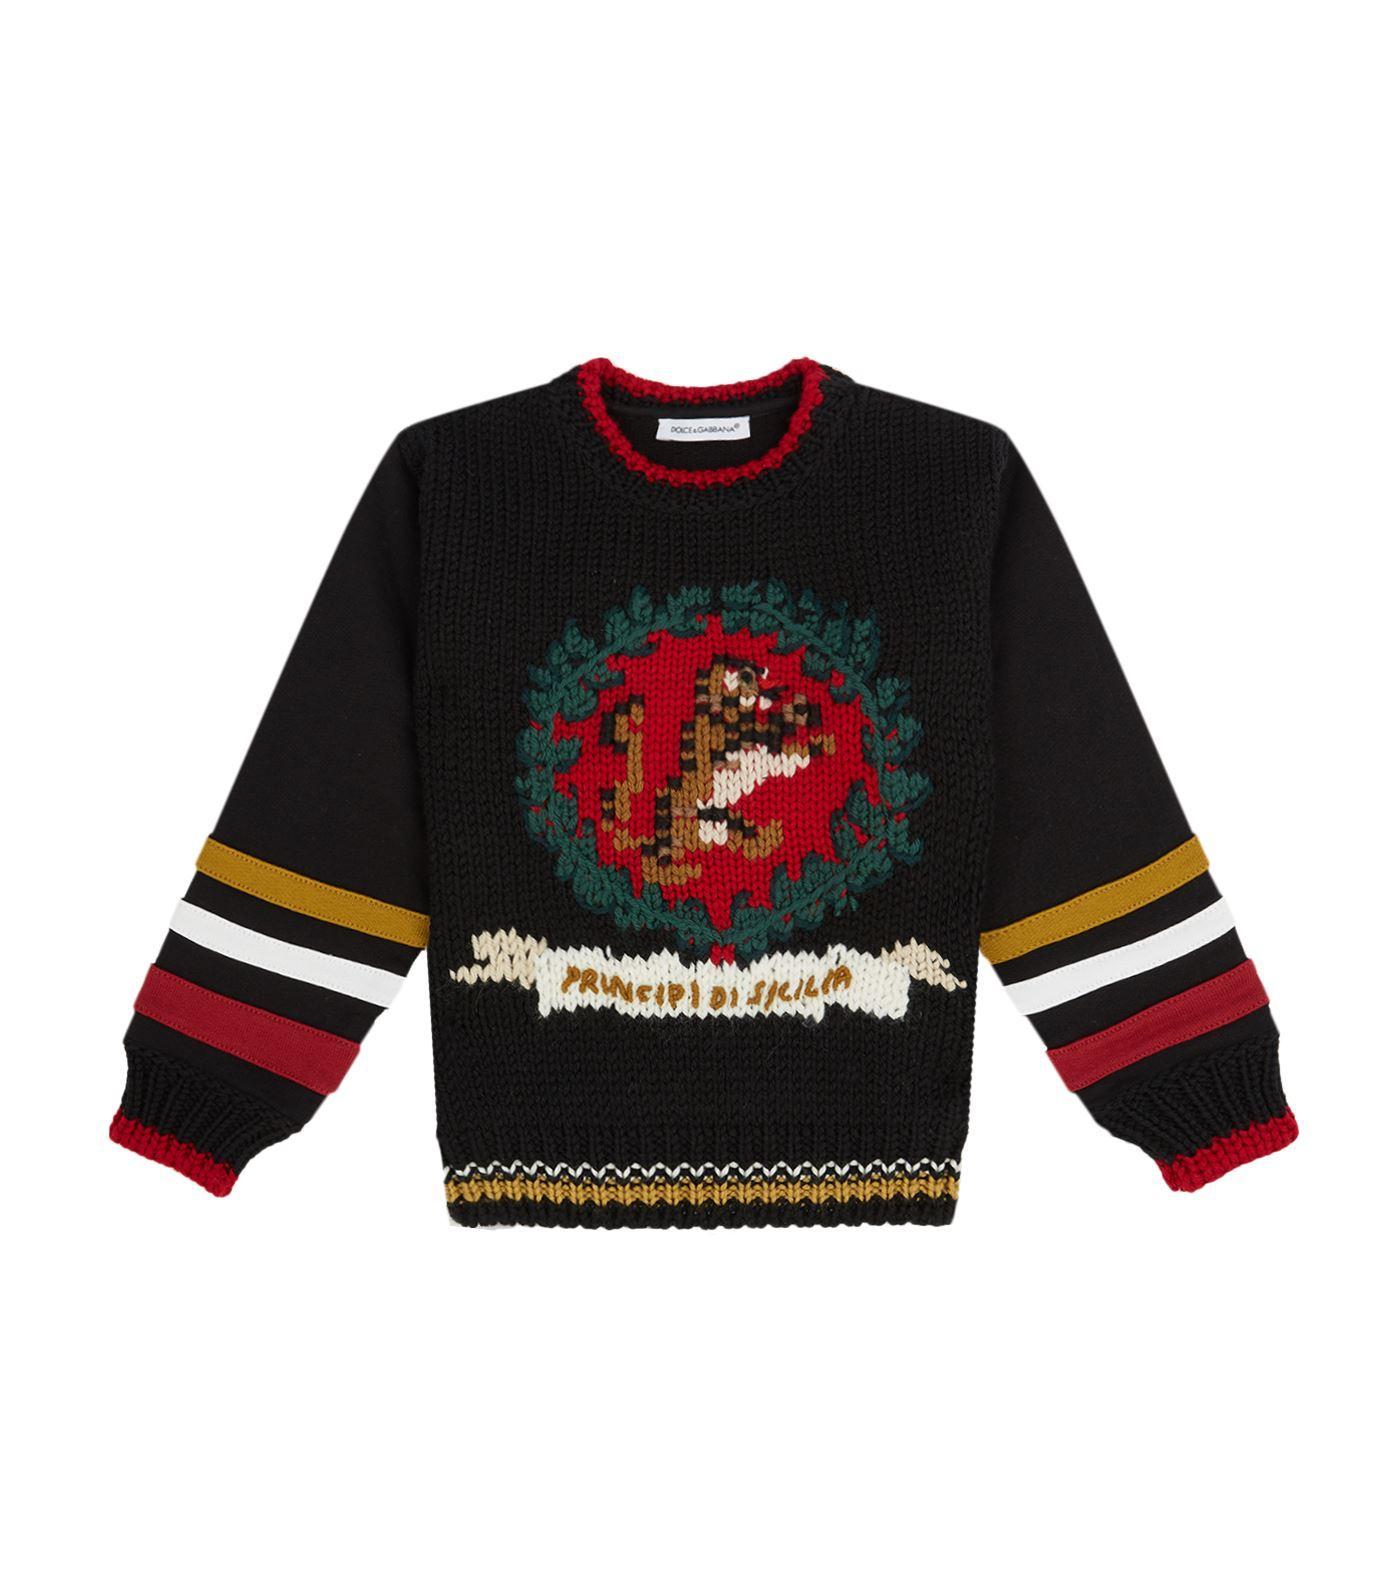 Dolce & Gabbana Knit Front Sweater In Multi